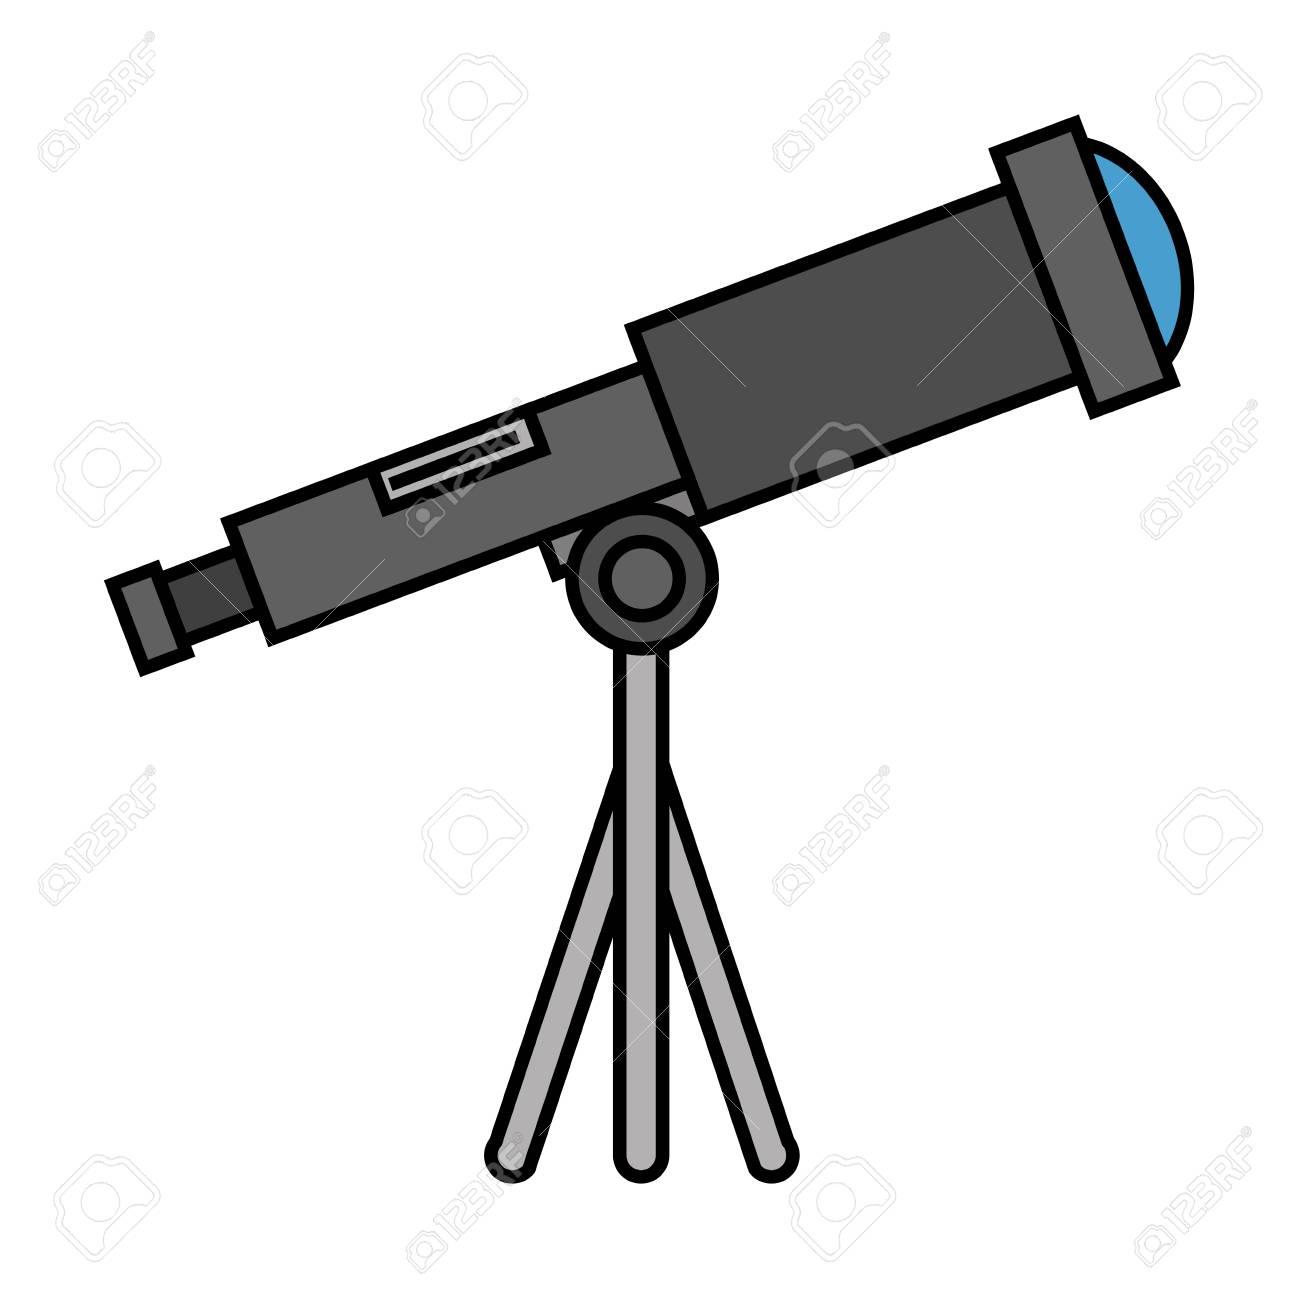 telescope device isolated icon vector illustration design - 111861053